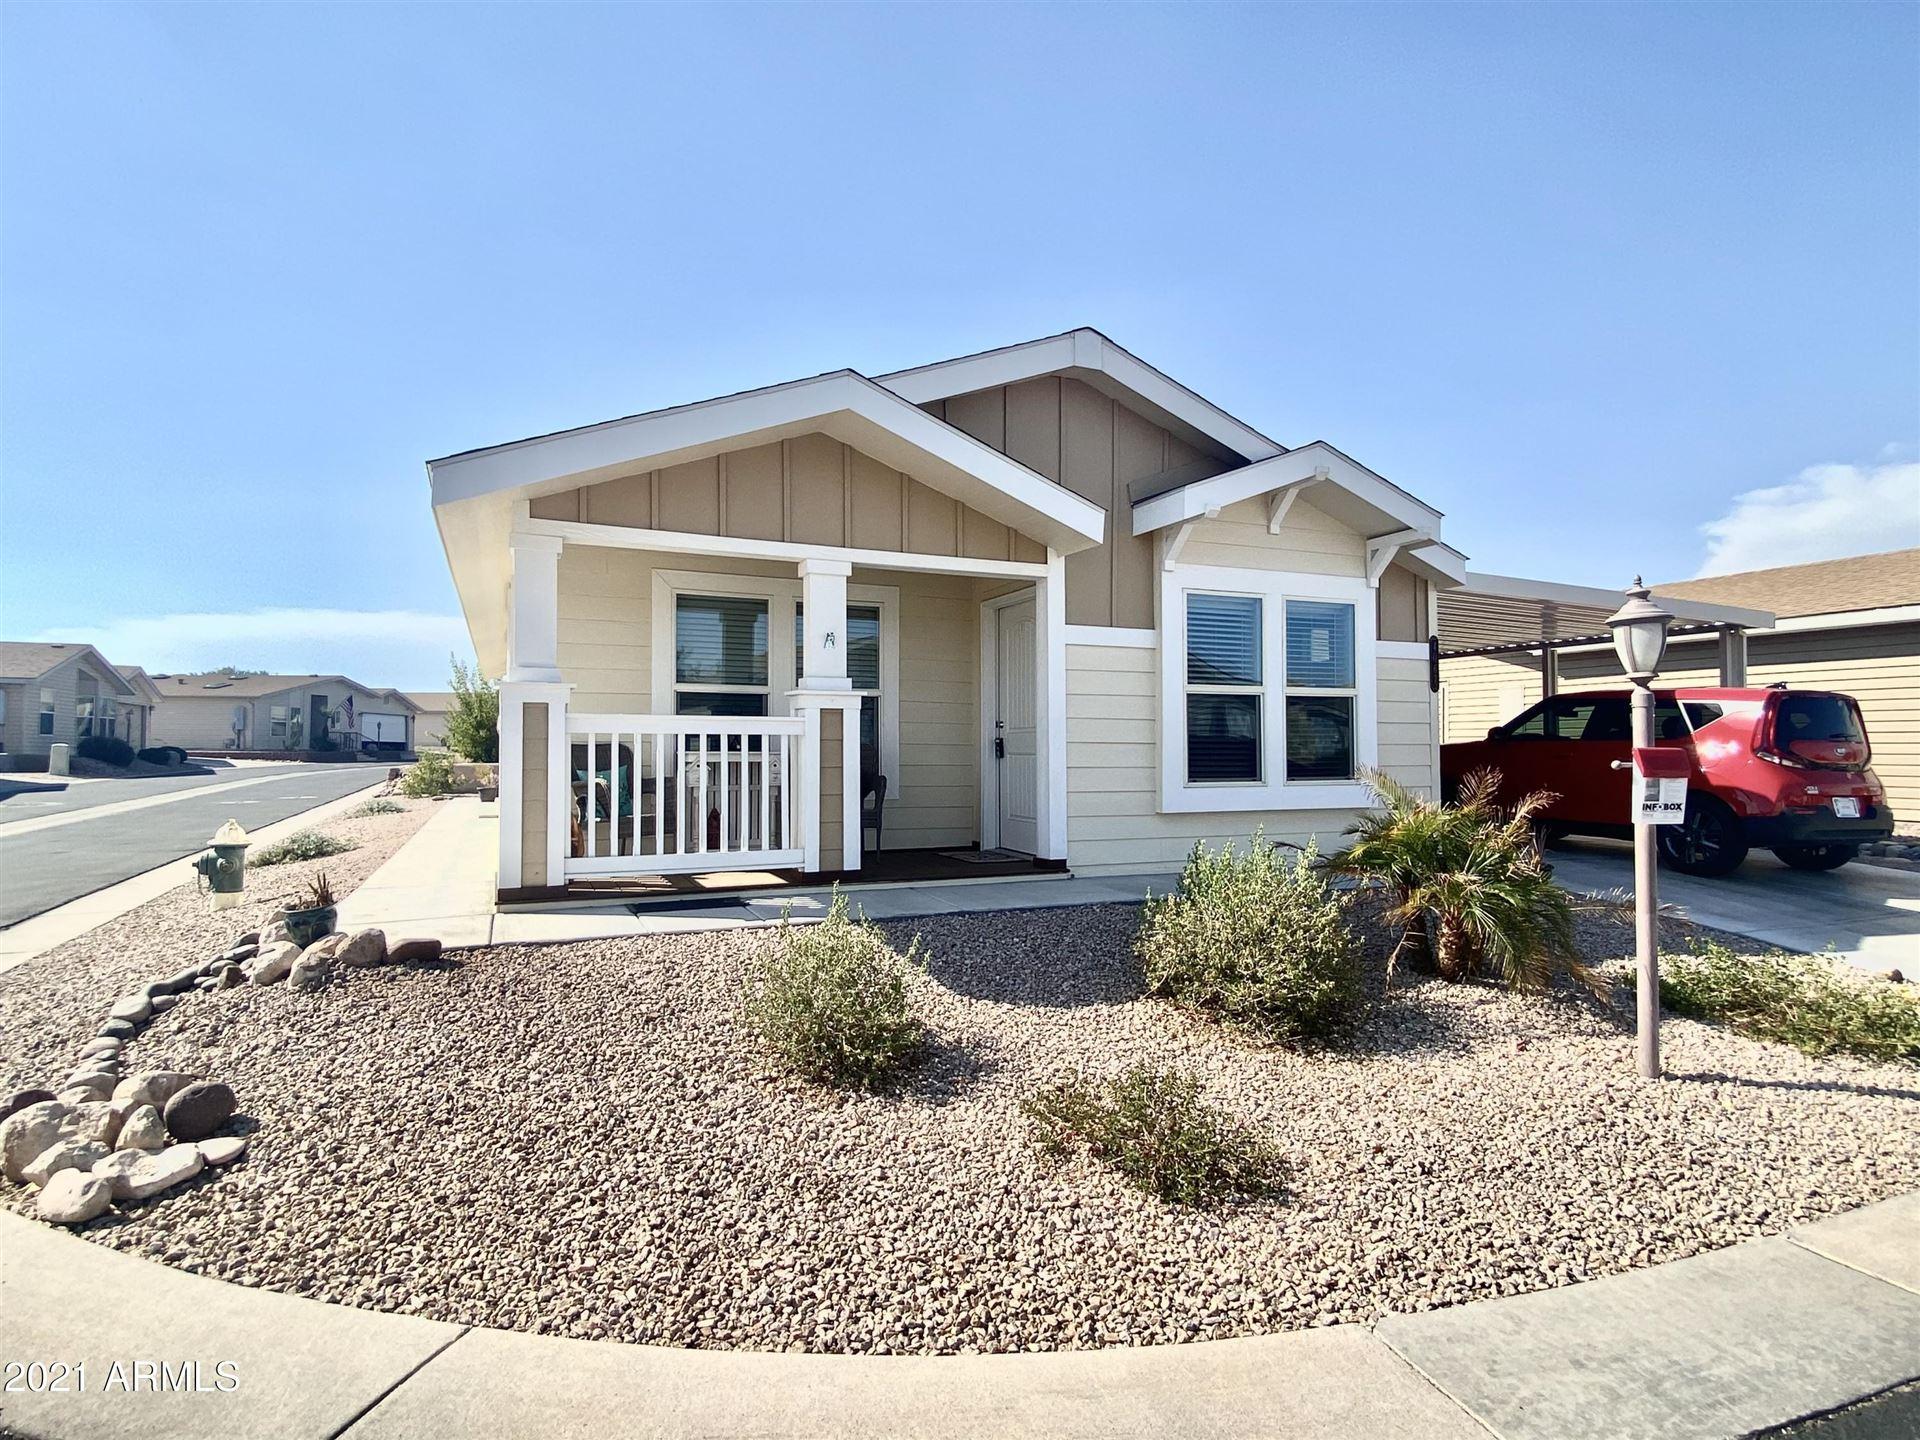 3301 S GOLDFIELD Road #4067, Apache Junction, AZ 85119 - #: 6263033